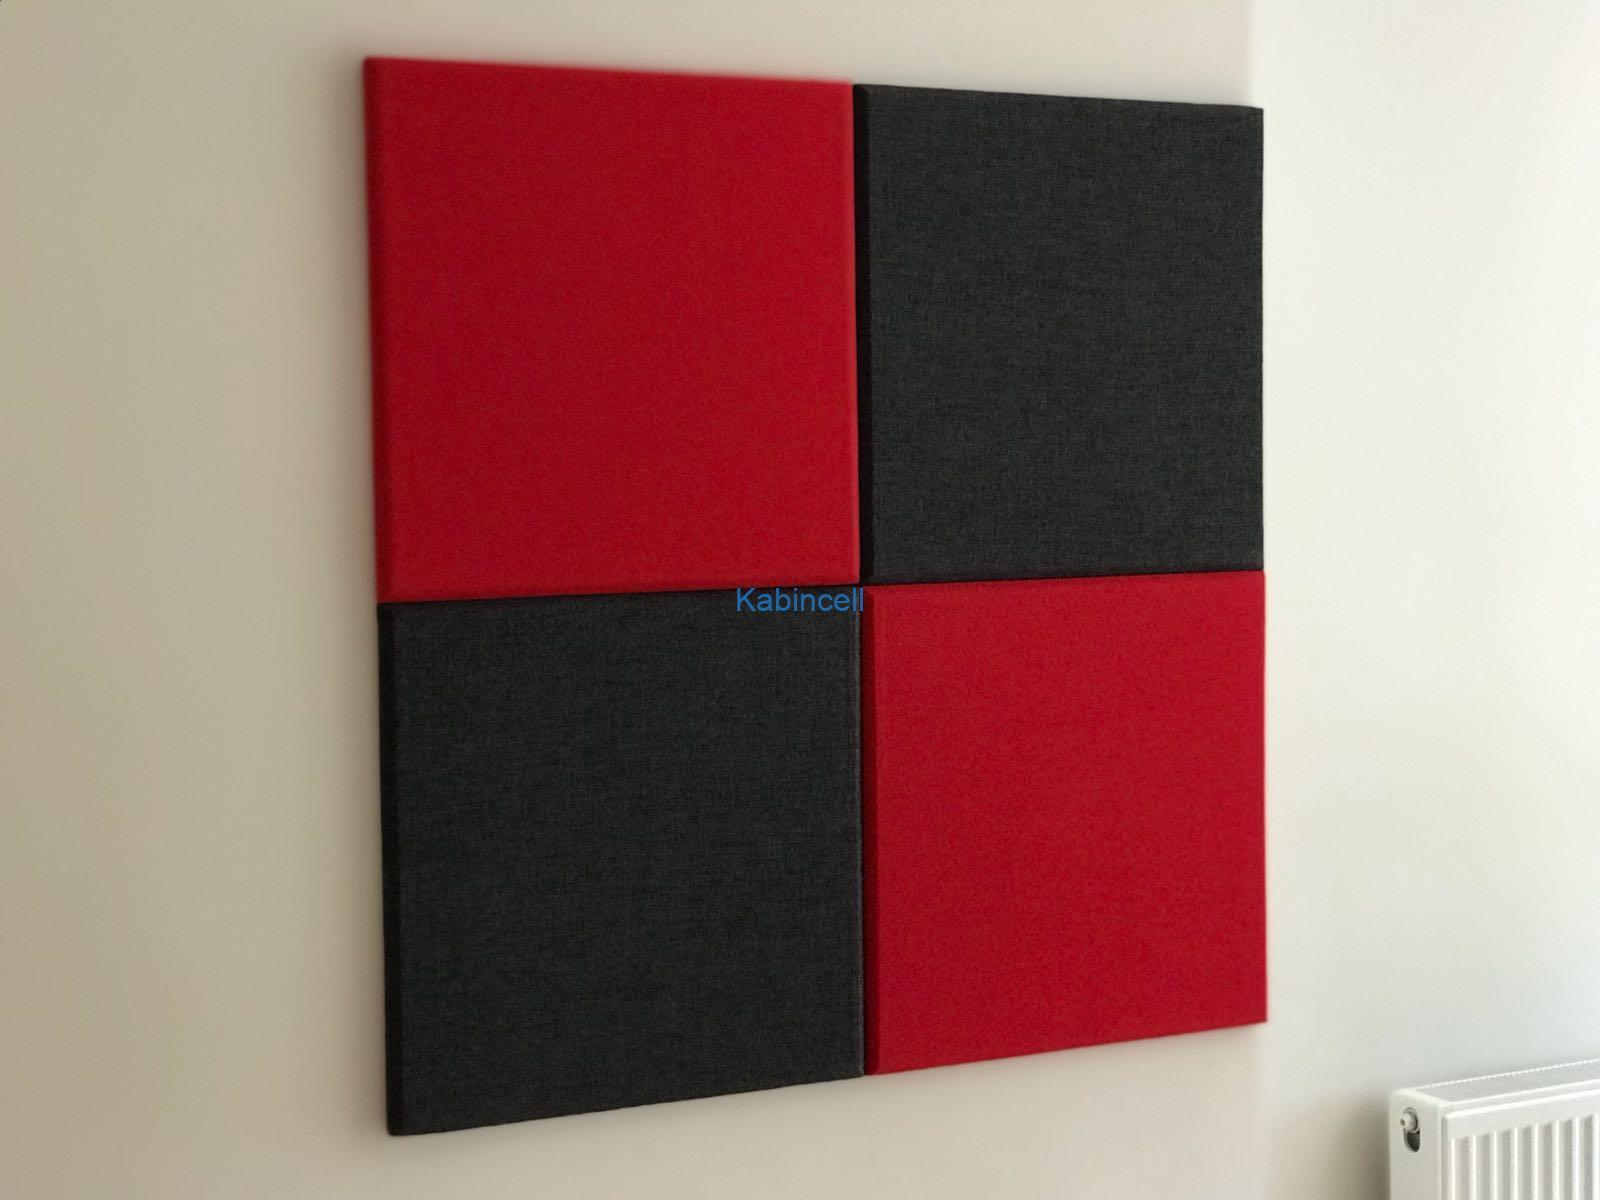 ofis-akustik-panel-kaplama-ses-ve-yanki-yalitimi7